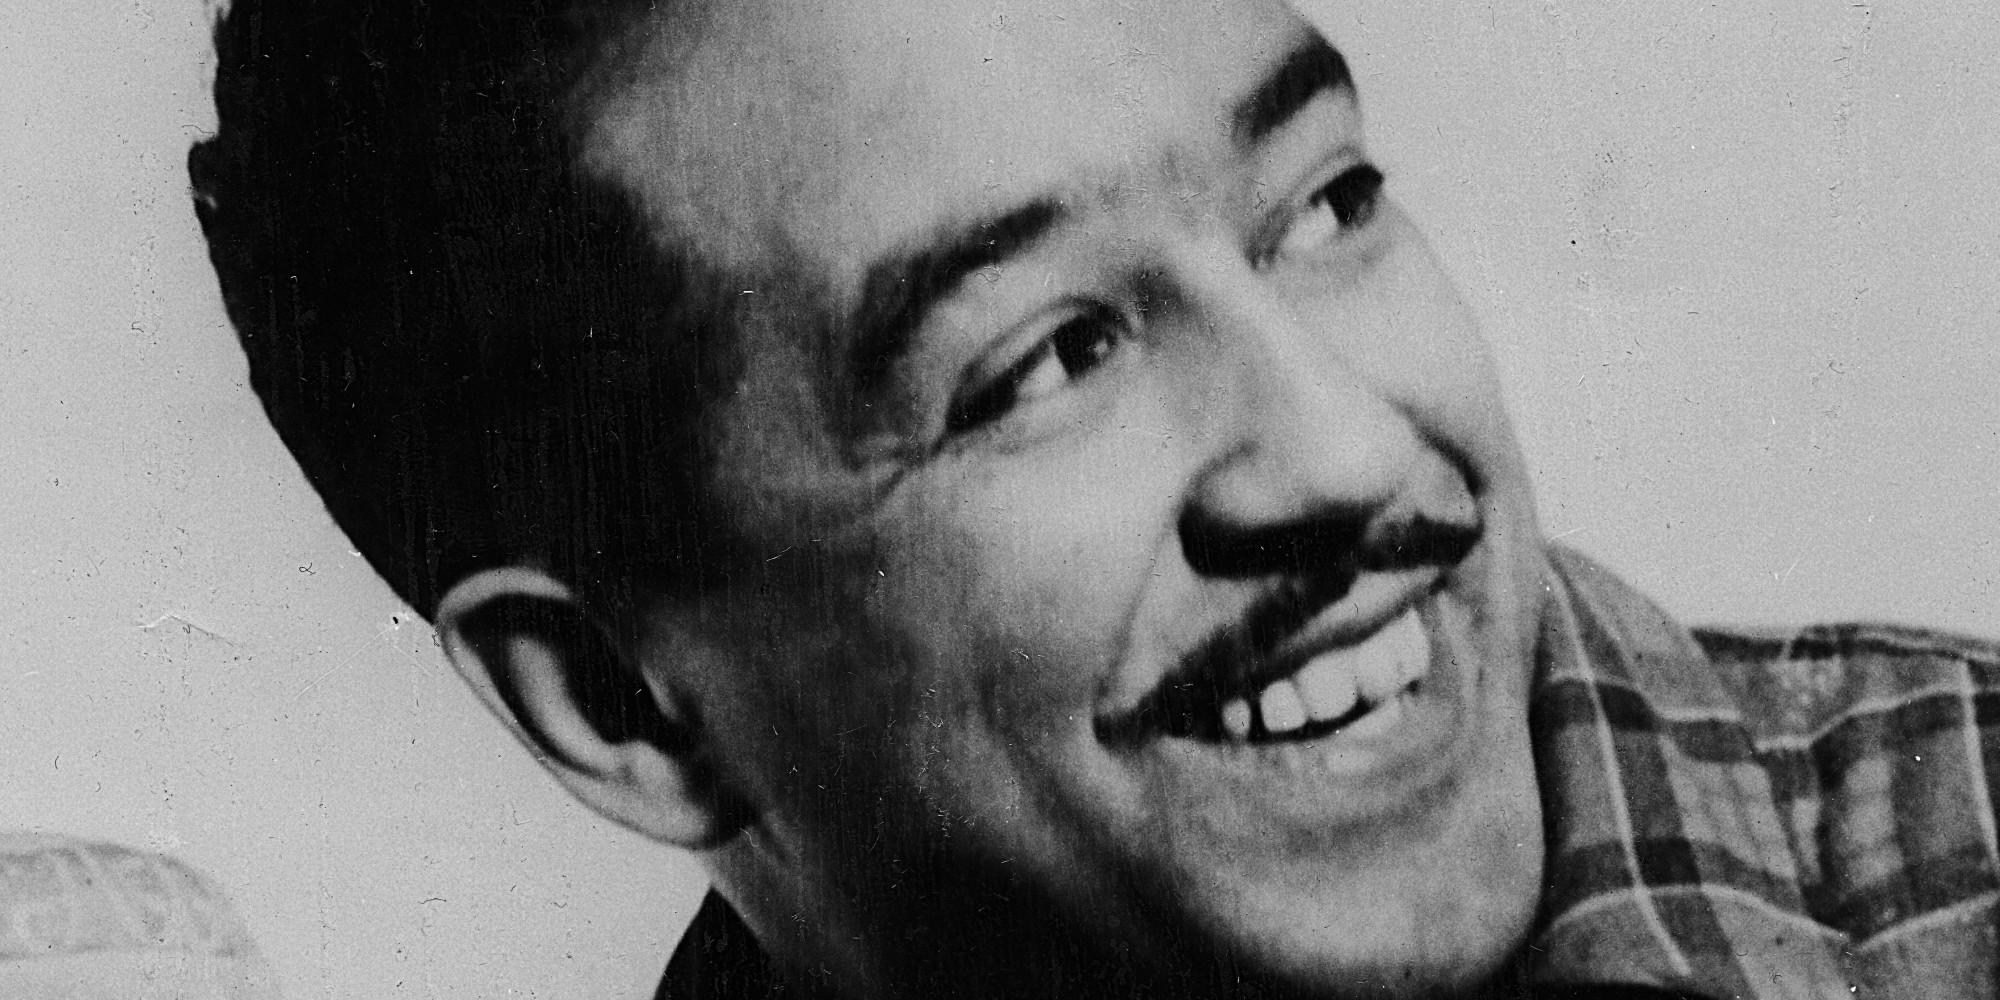 Langston Hughes (1902-1967)